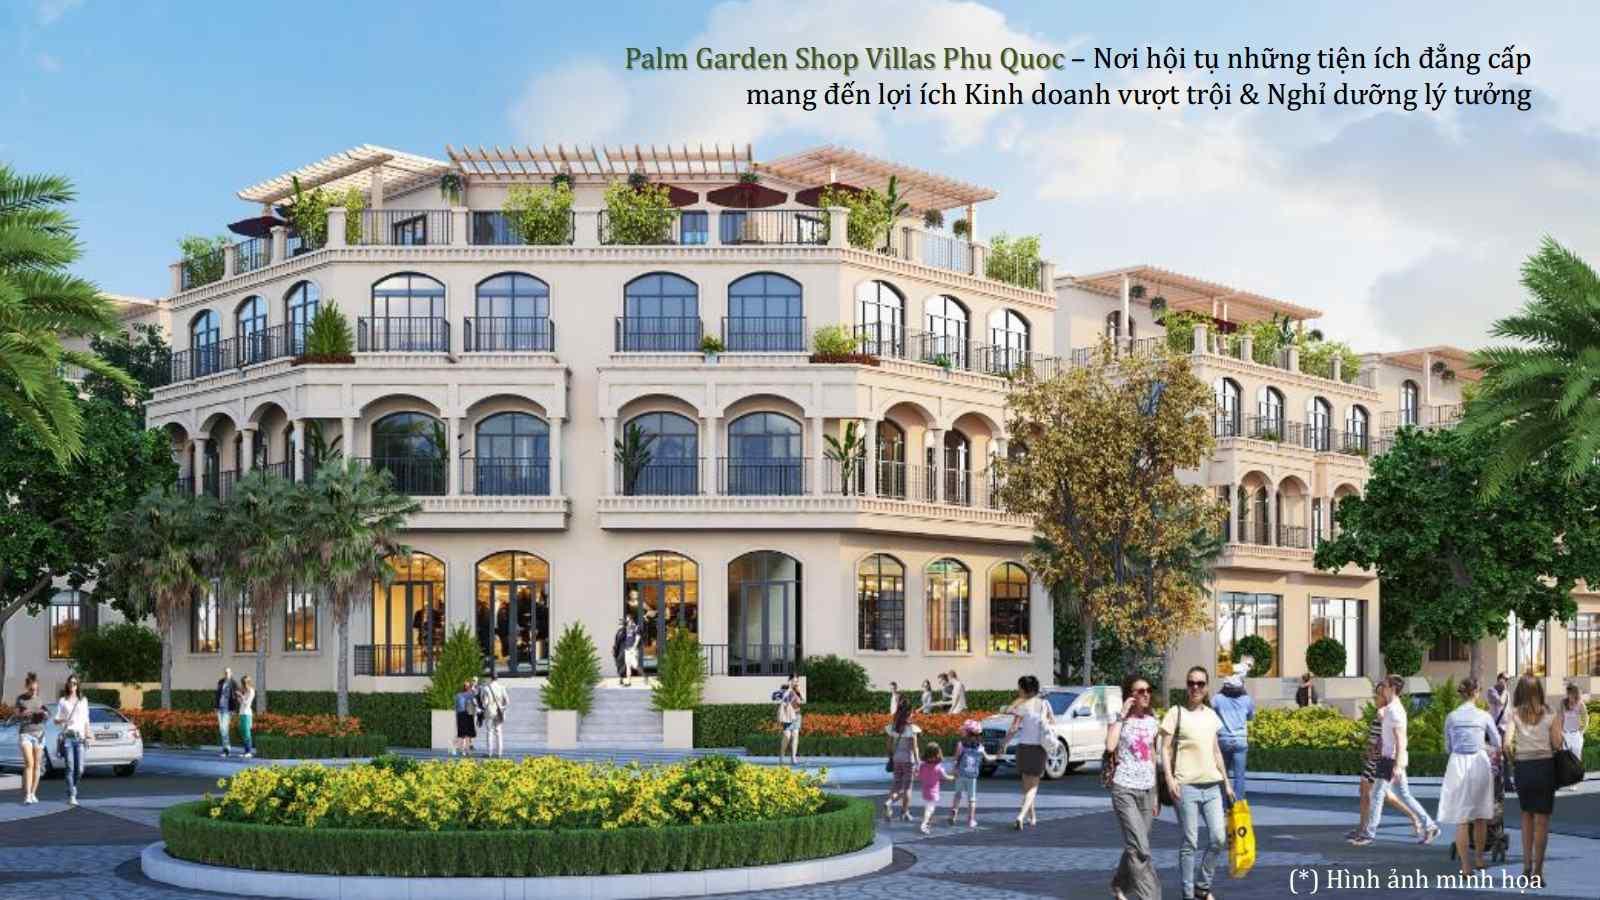 phoi-canh-palm-garden-shop-villas-phu-quoc